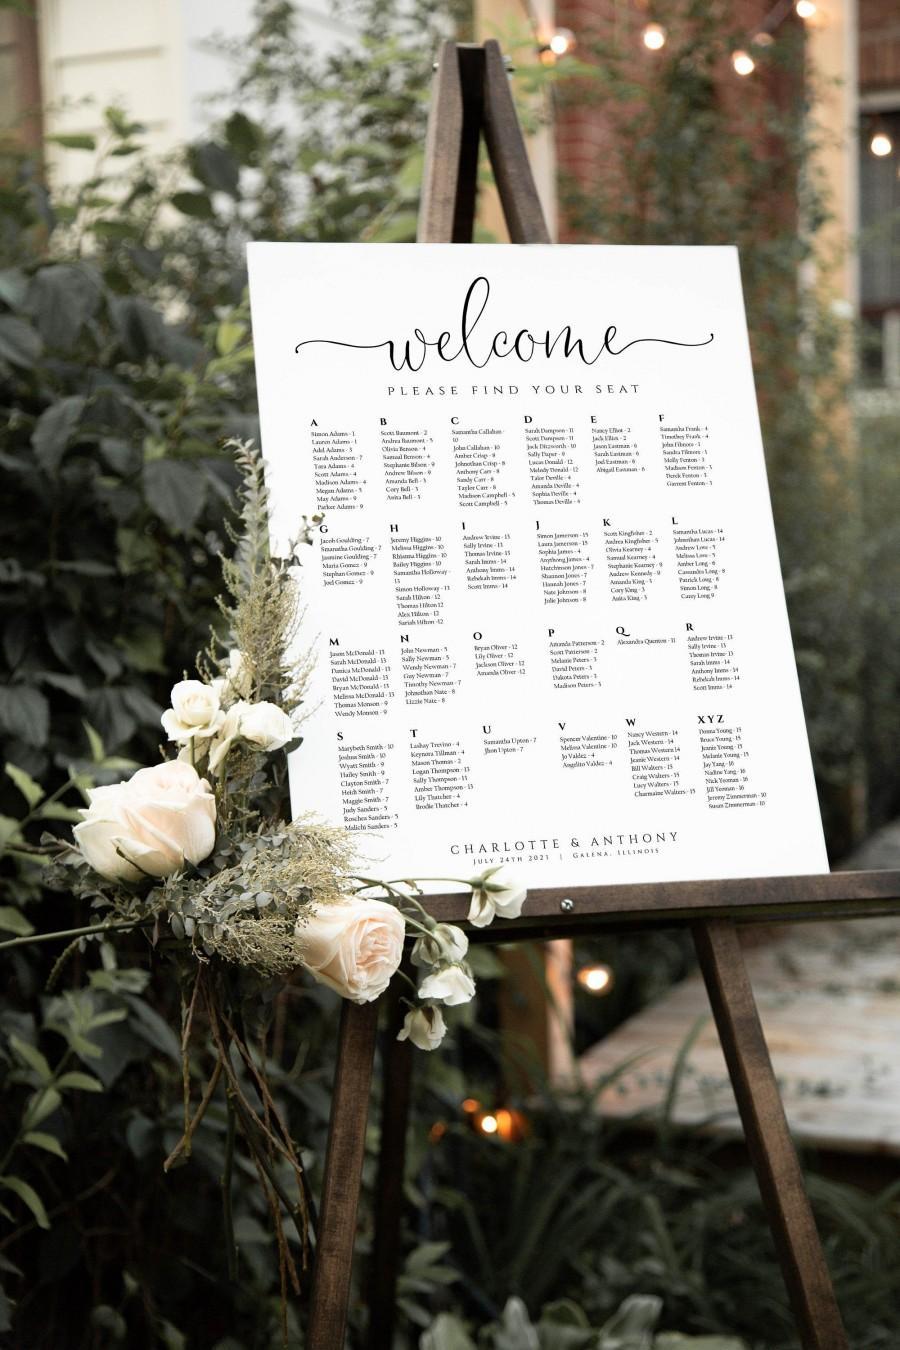 Свадьба - Script Seating chart, Wedding Seating Chart, Alphabetical Seating Chart, Wedding Poster, Edit with TEMPLETT, WLP-FAN 4208